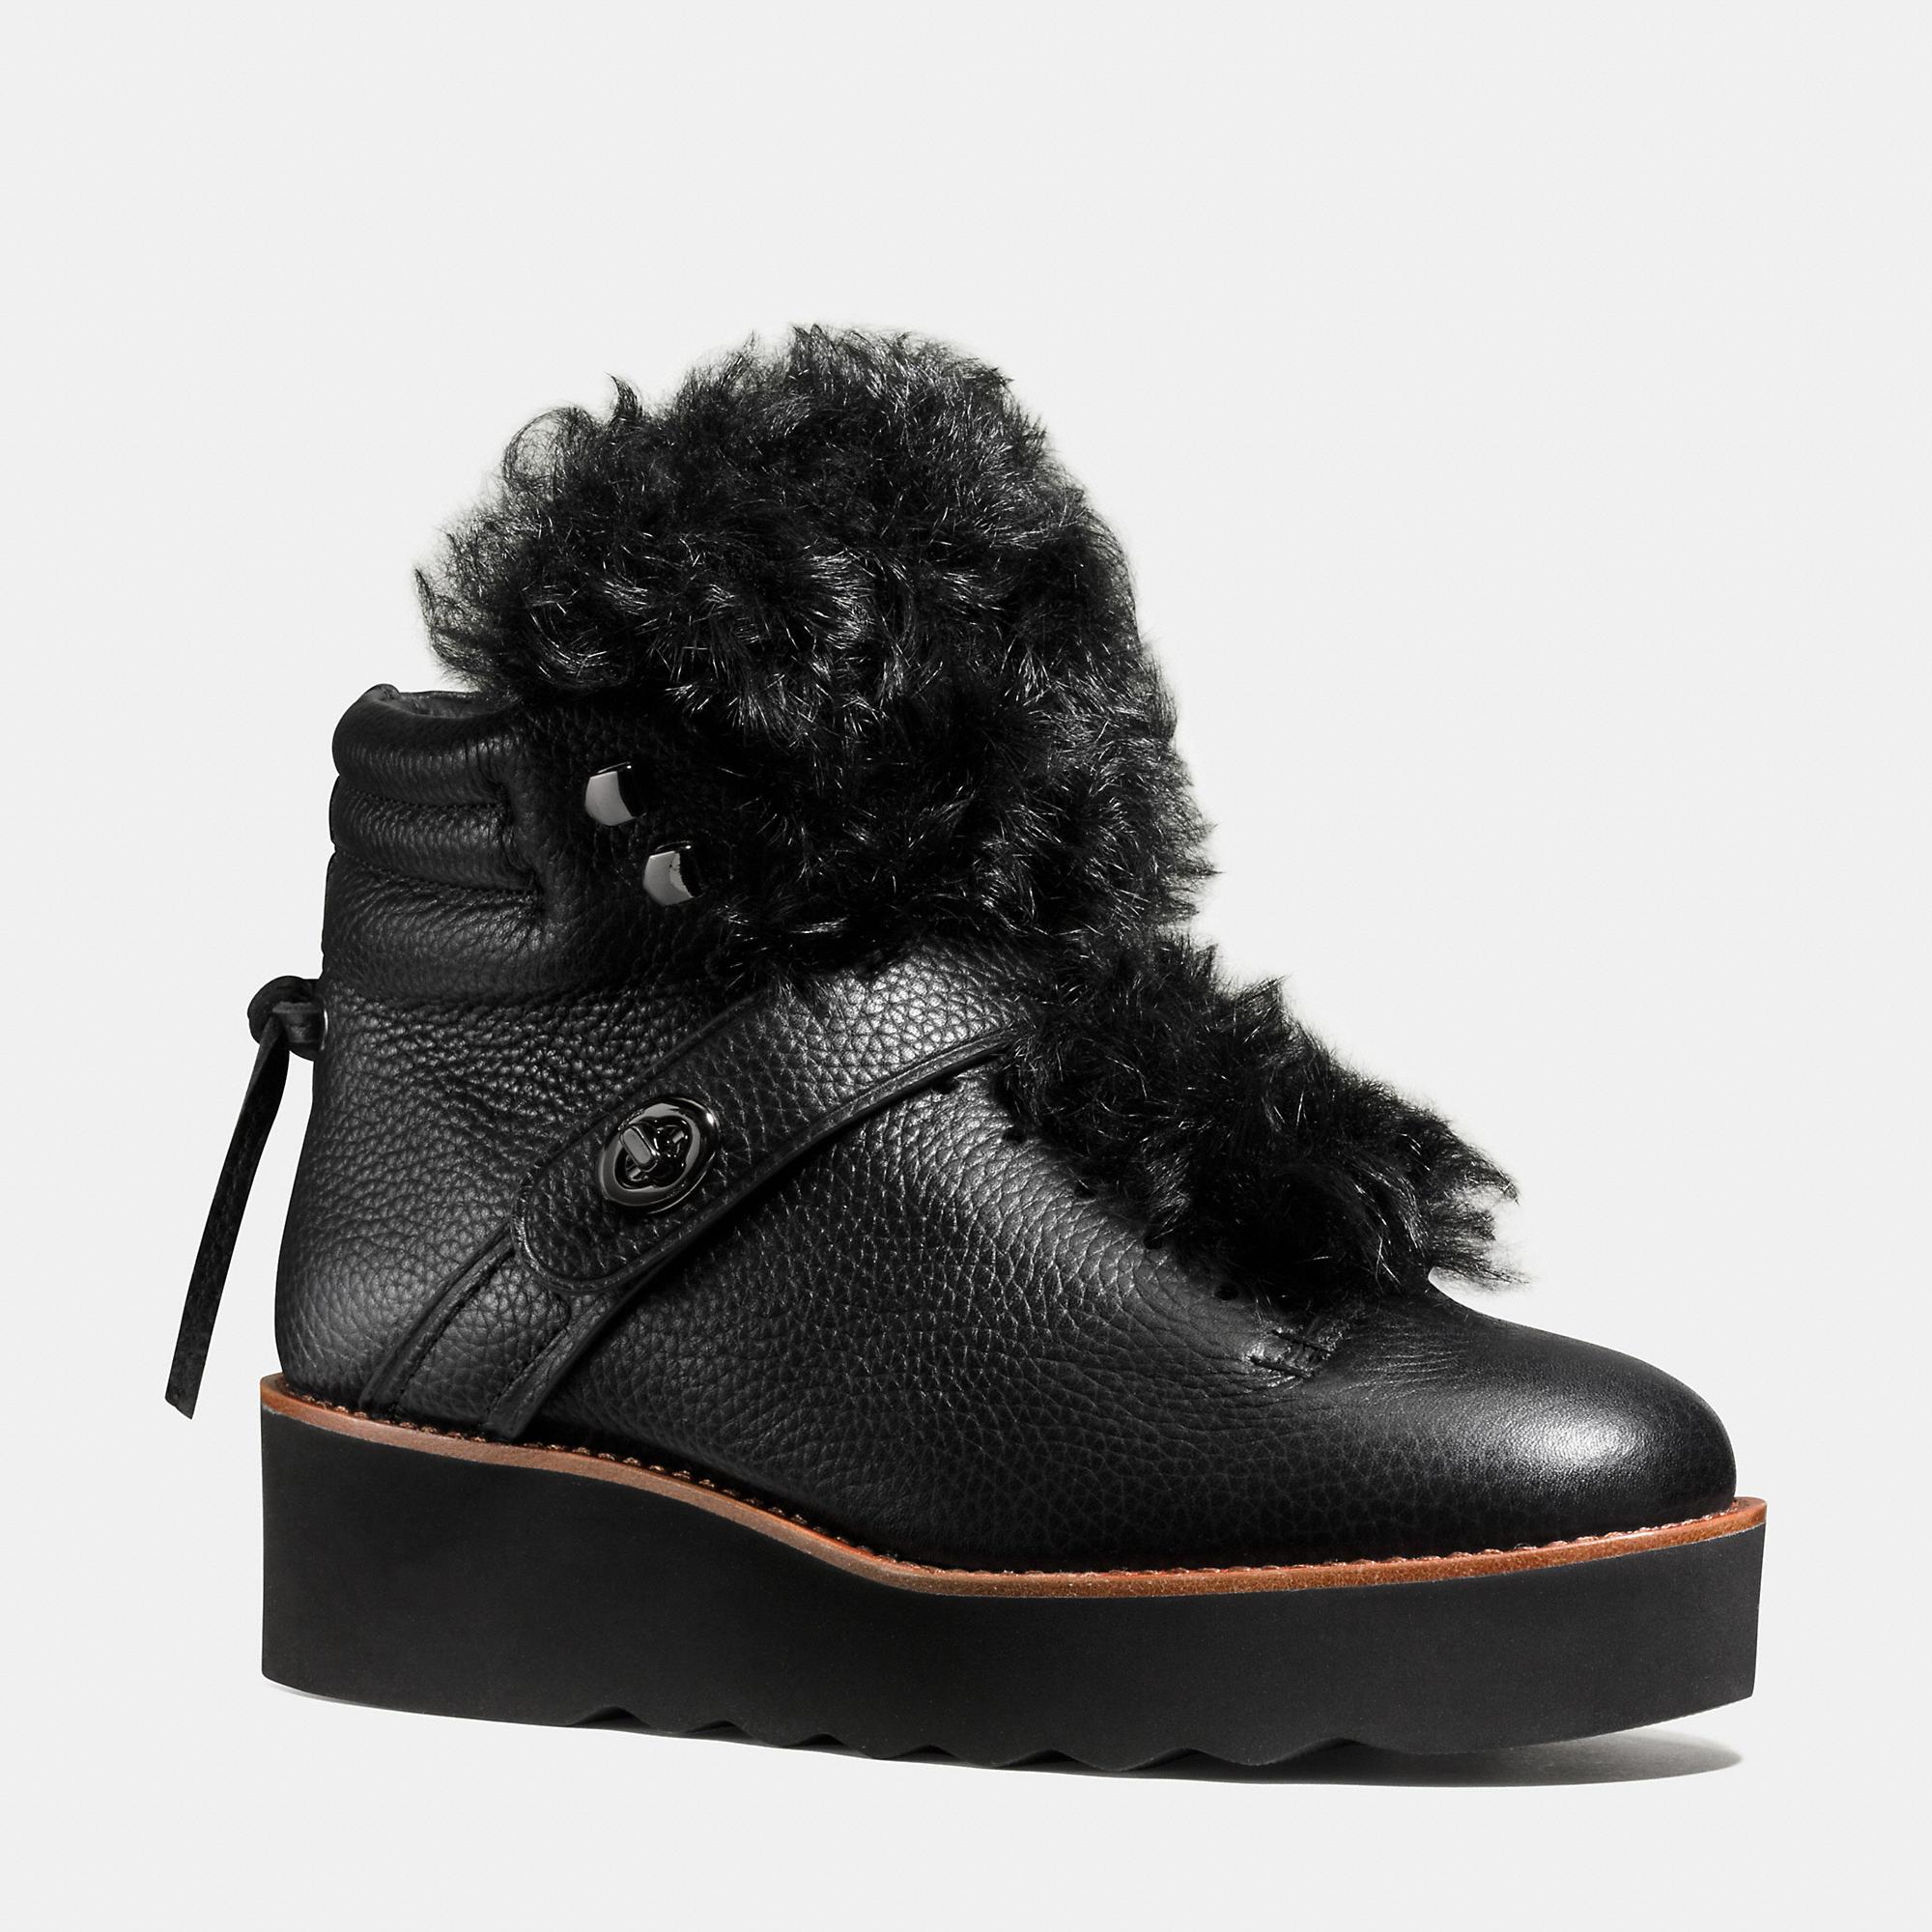 COACH BLACK URBAN HIKER BOOTS